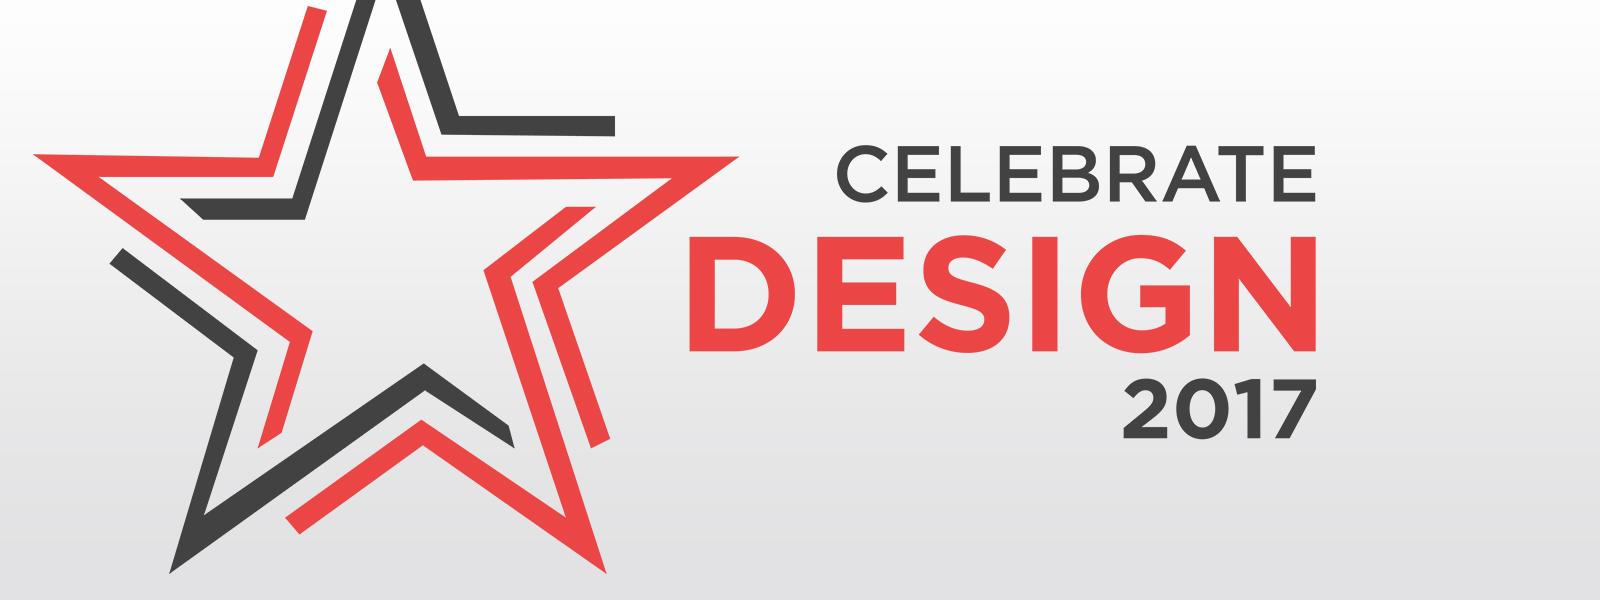 Celebrate Design 2017